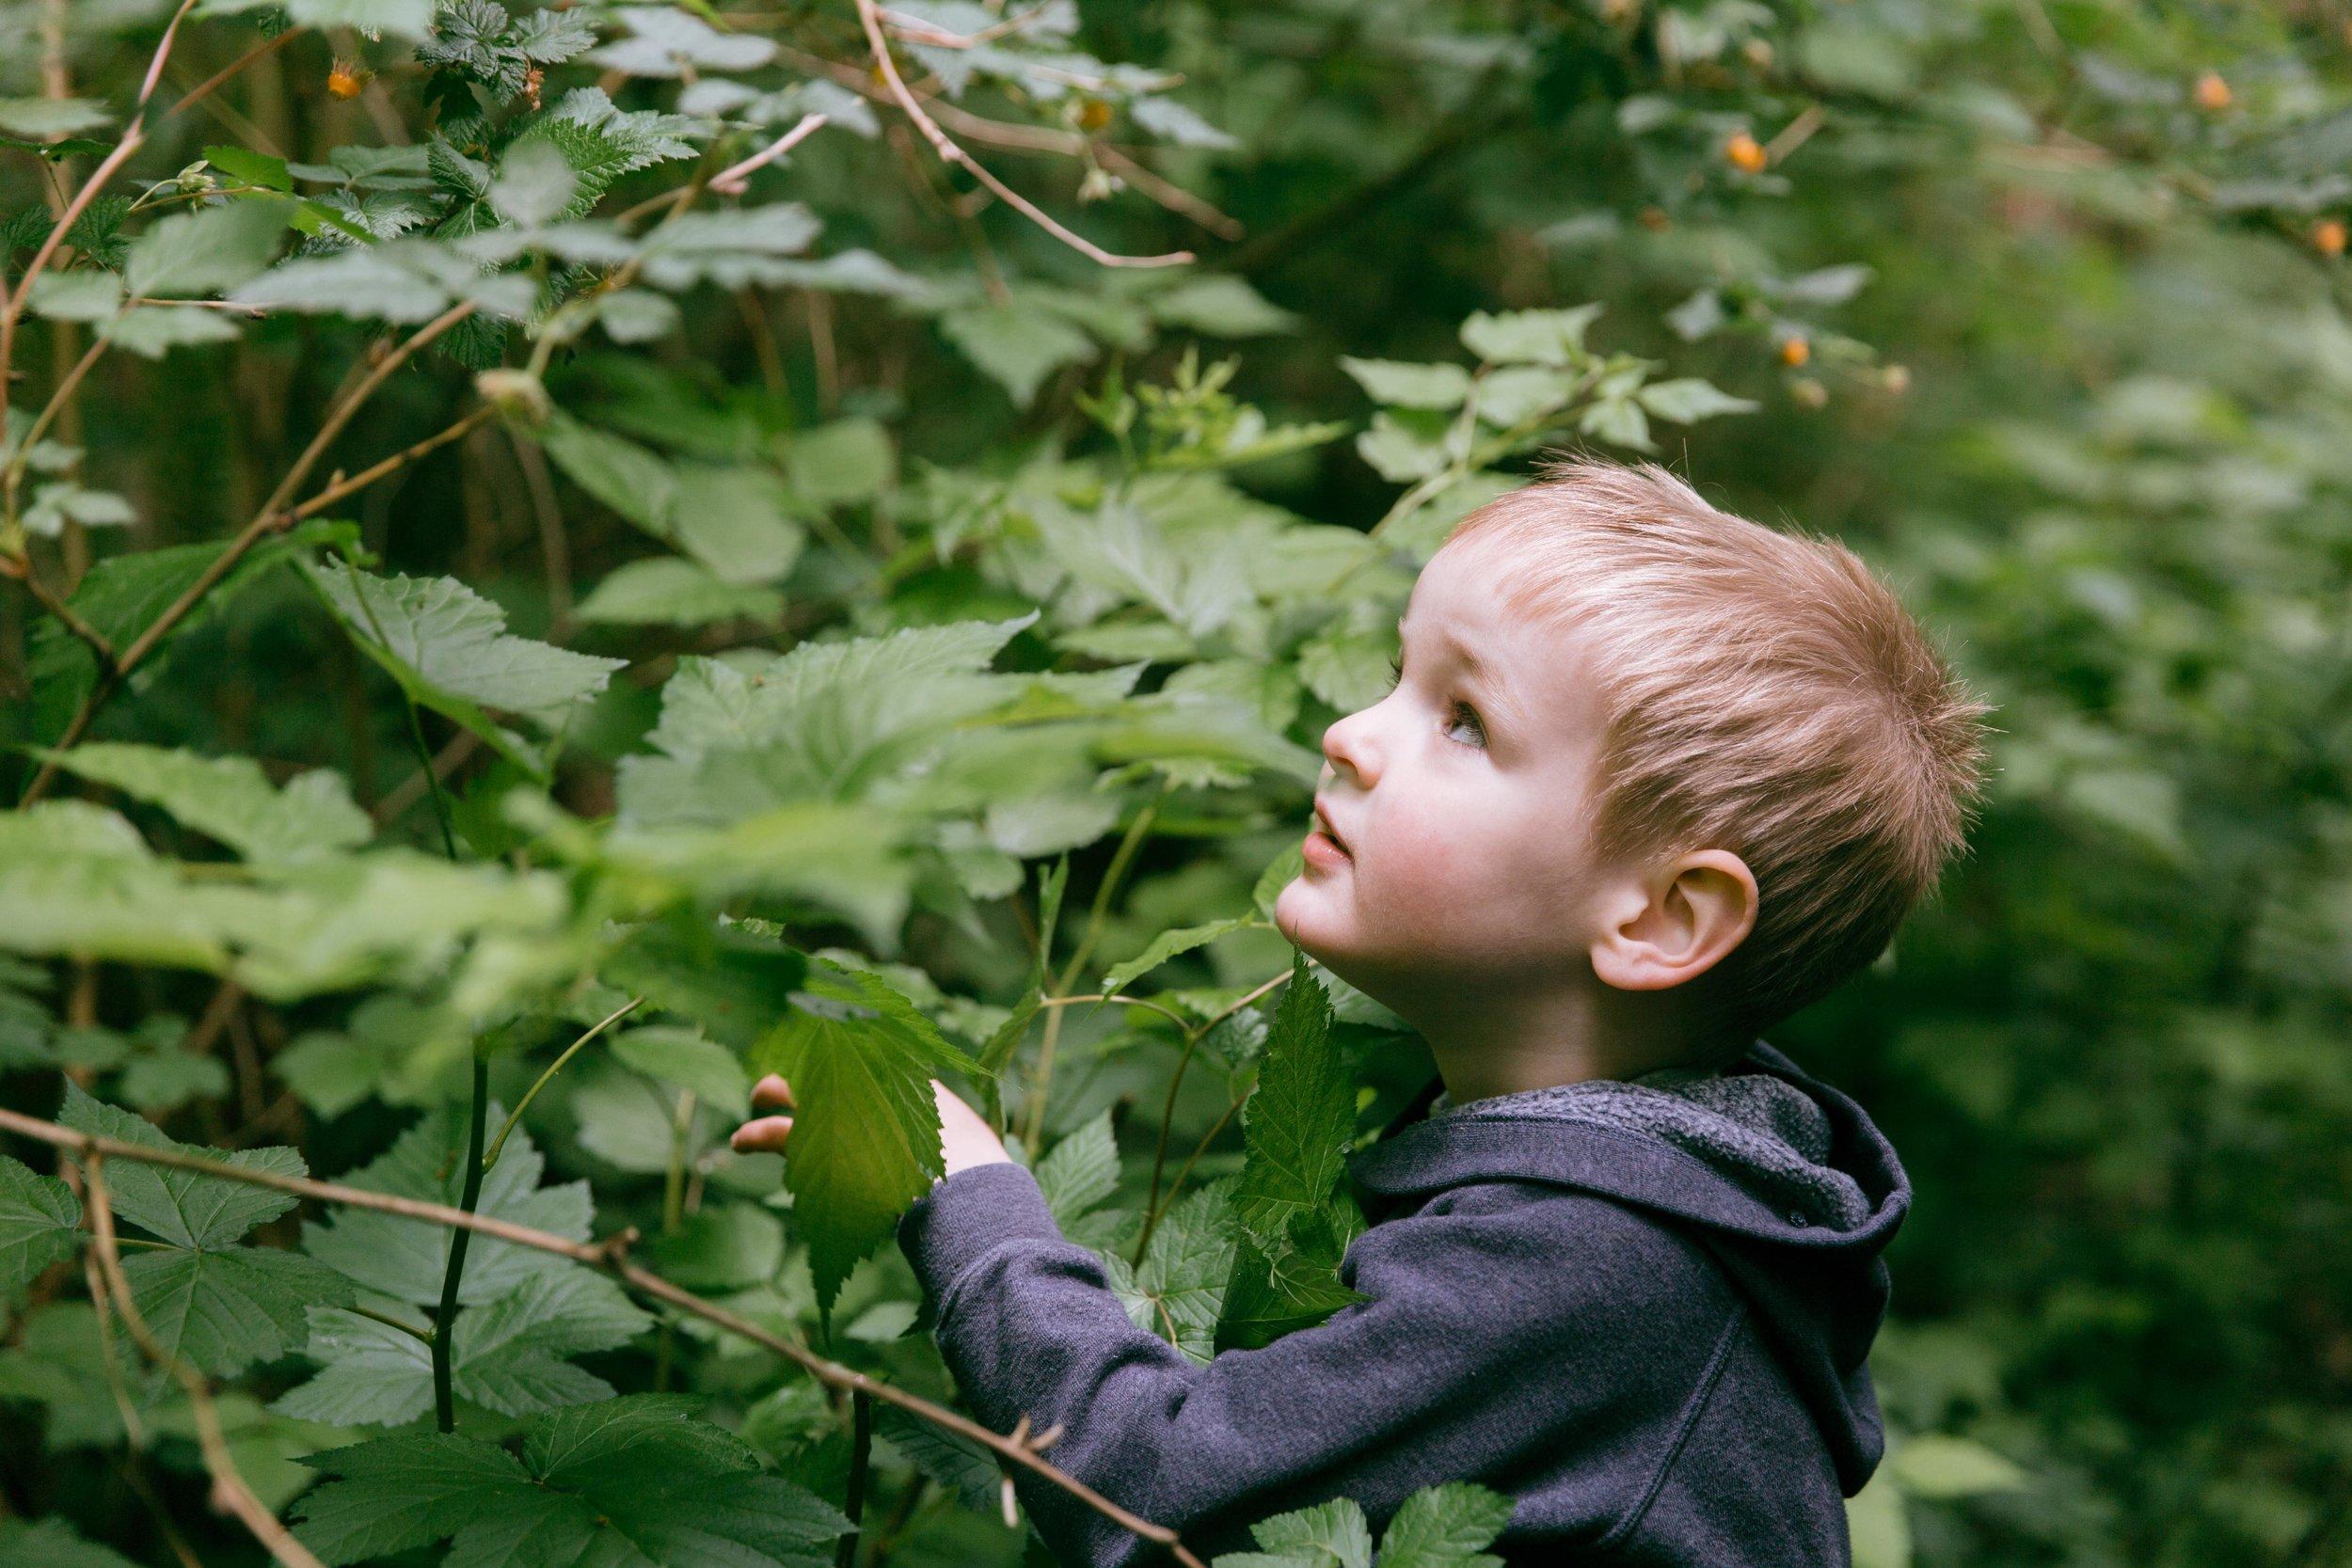 Sienna-Renee-Photography-Nature-Nuts-4006.jpg